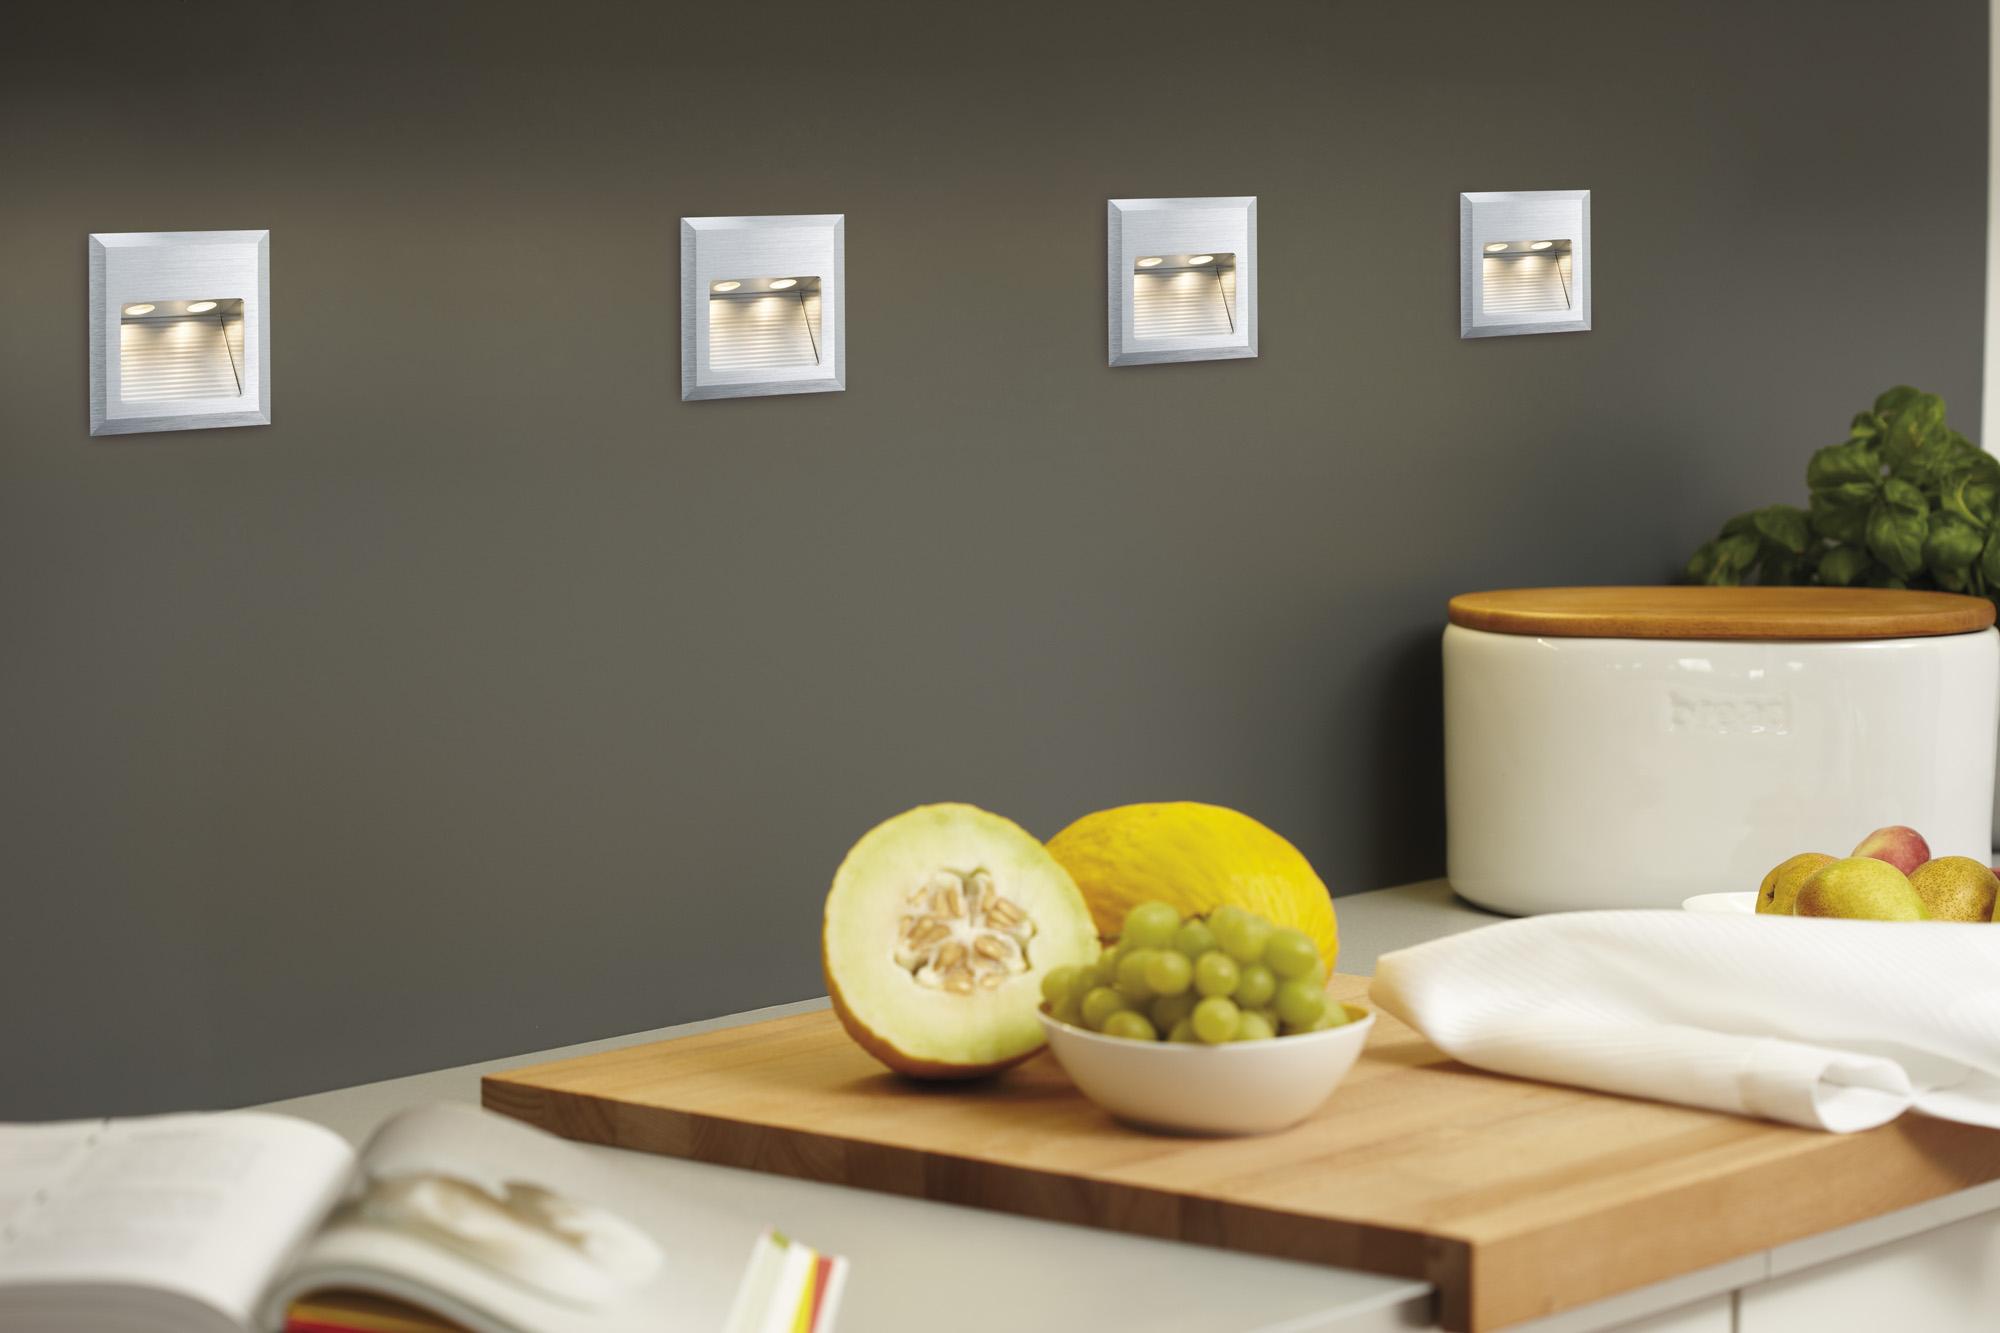 paulmann wandeinbauleuchte special line quadro online kaufen im voltus elektro shop. Black Bedroom Furniture Sets. Home Design Ideas